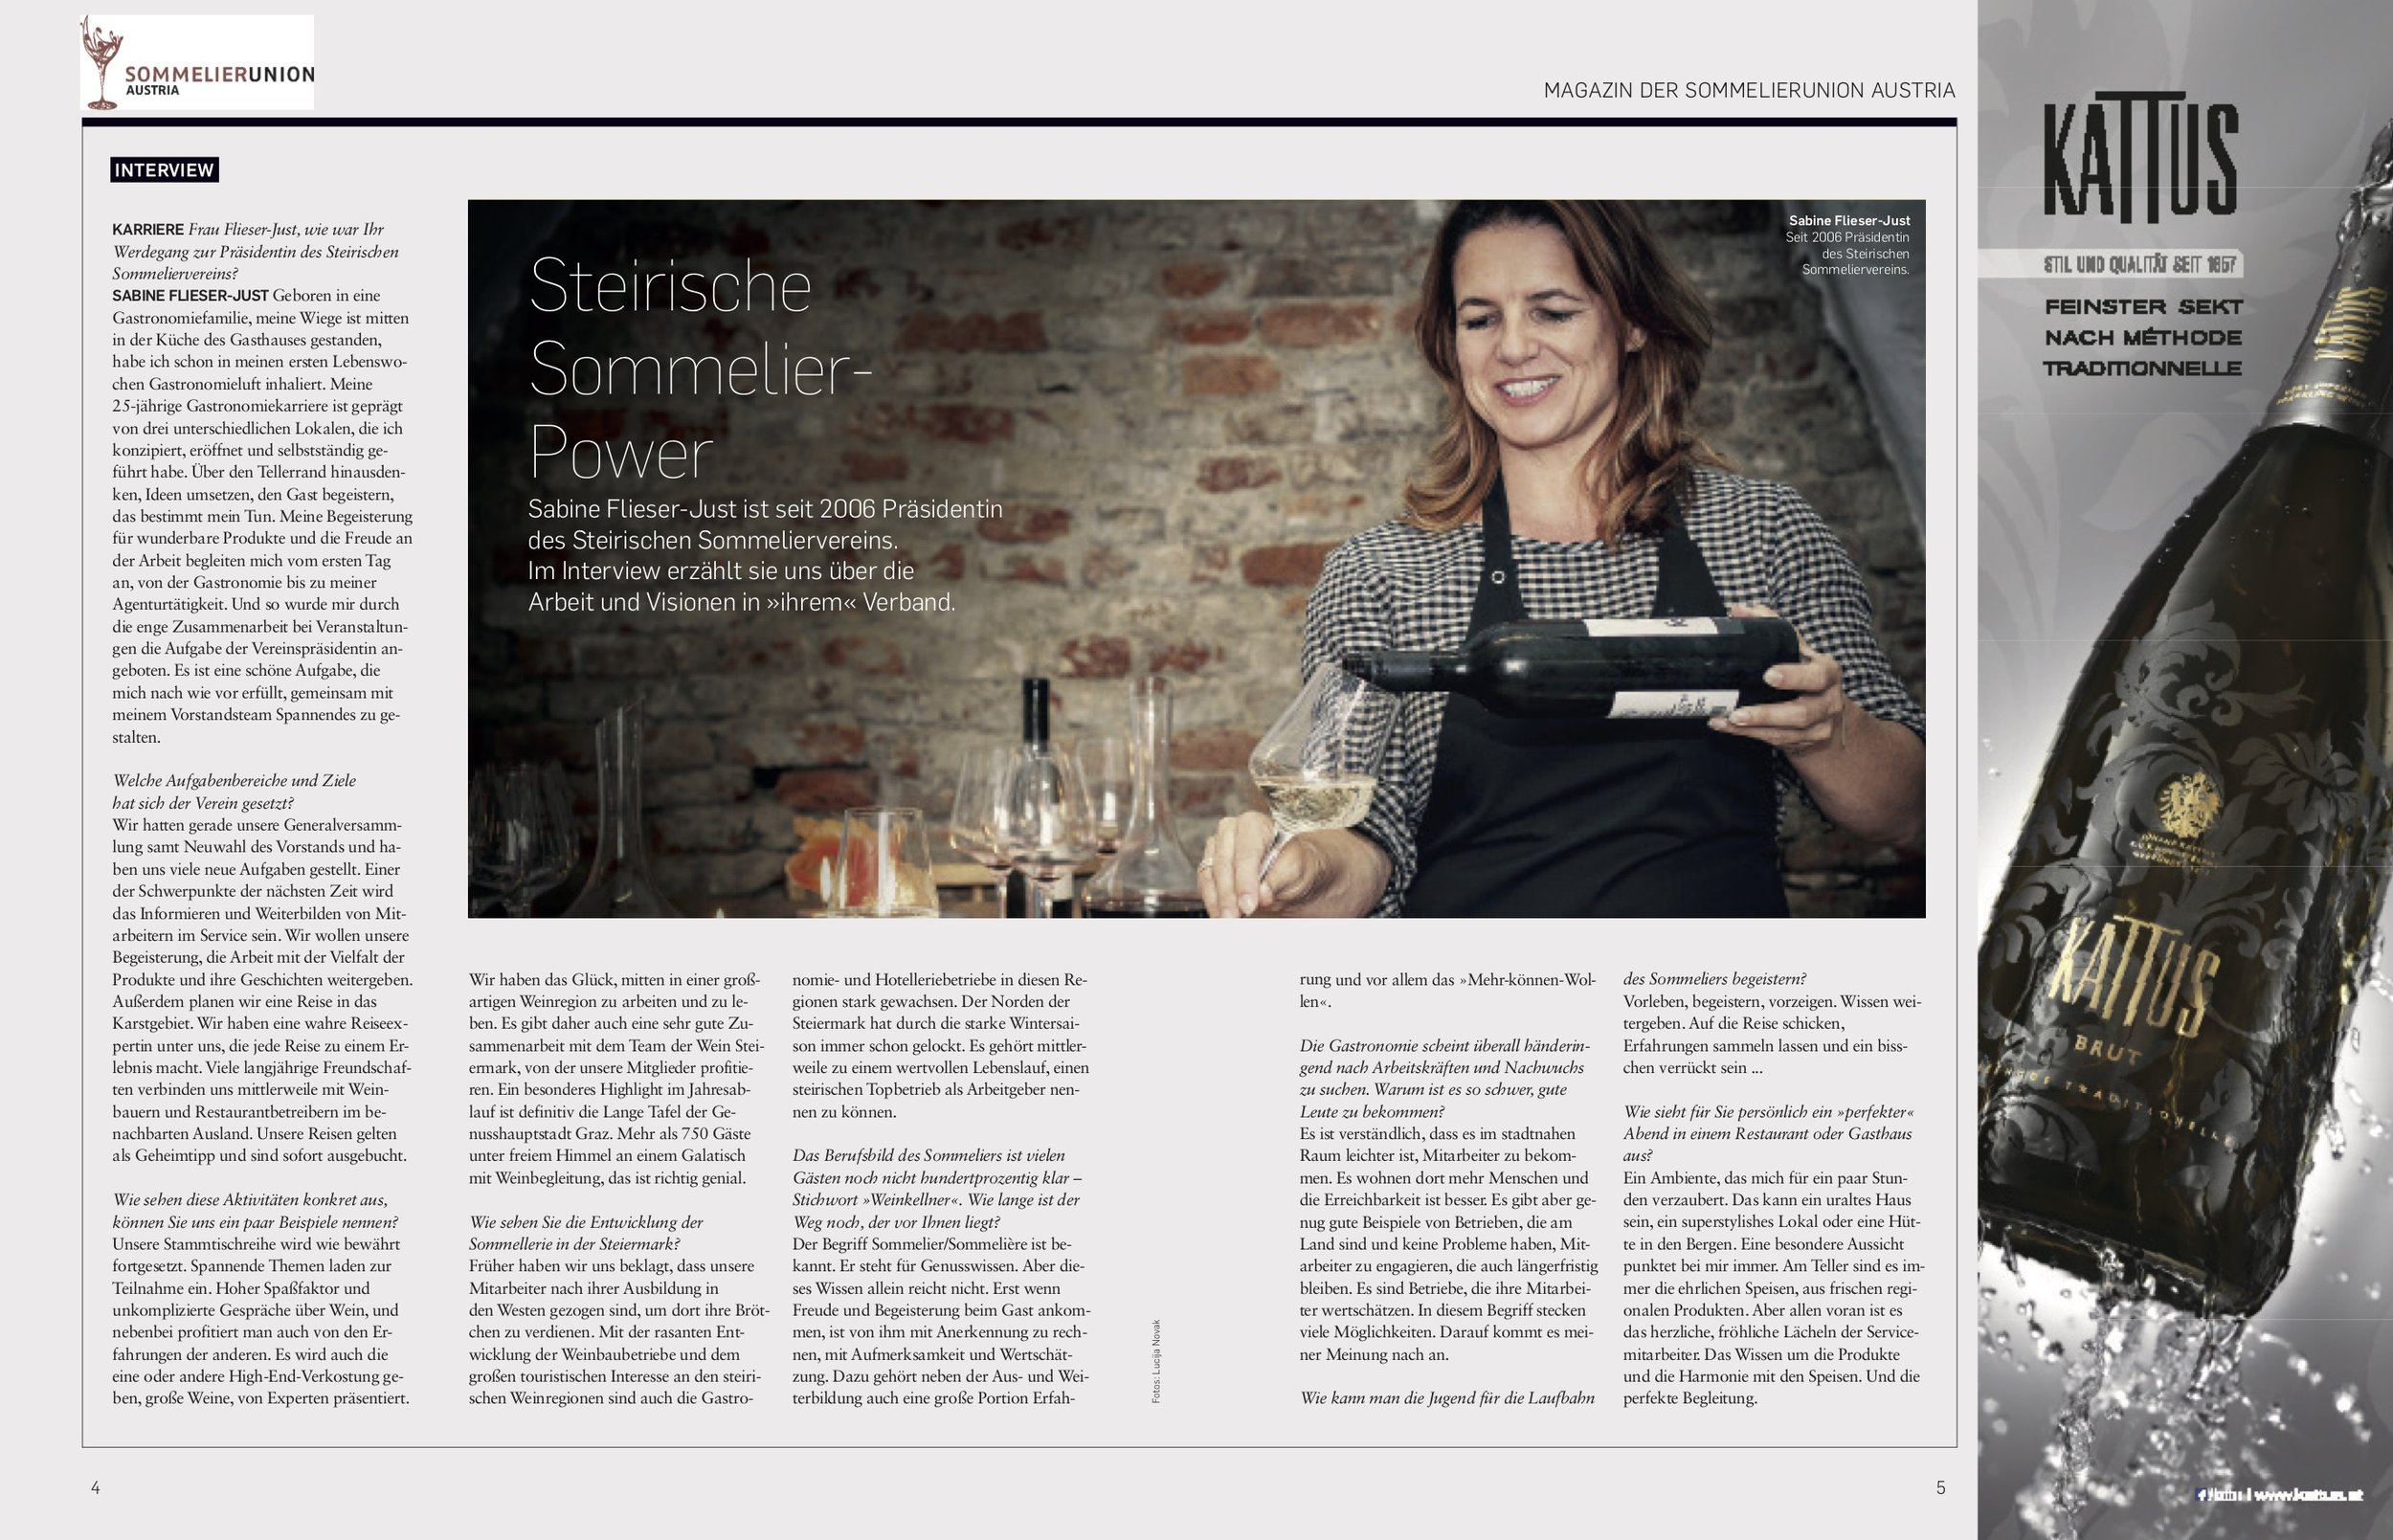 fjob_Sommeliermagazin_Interview_Flieser-Just.jpg